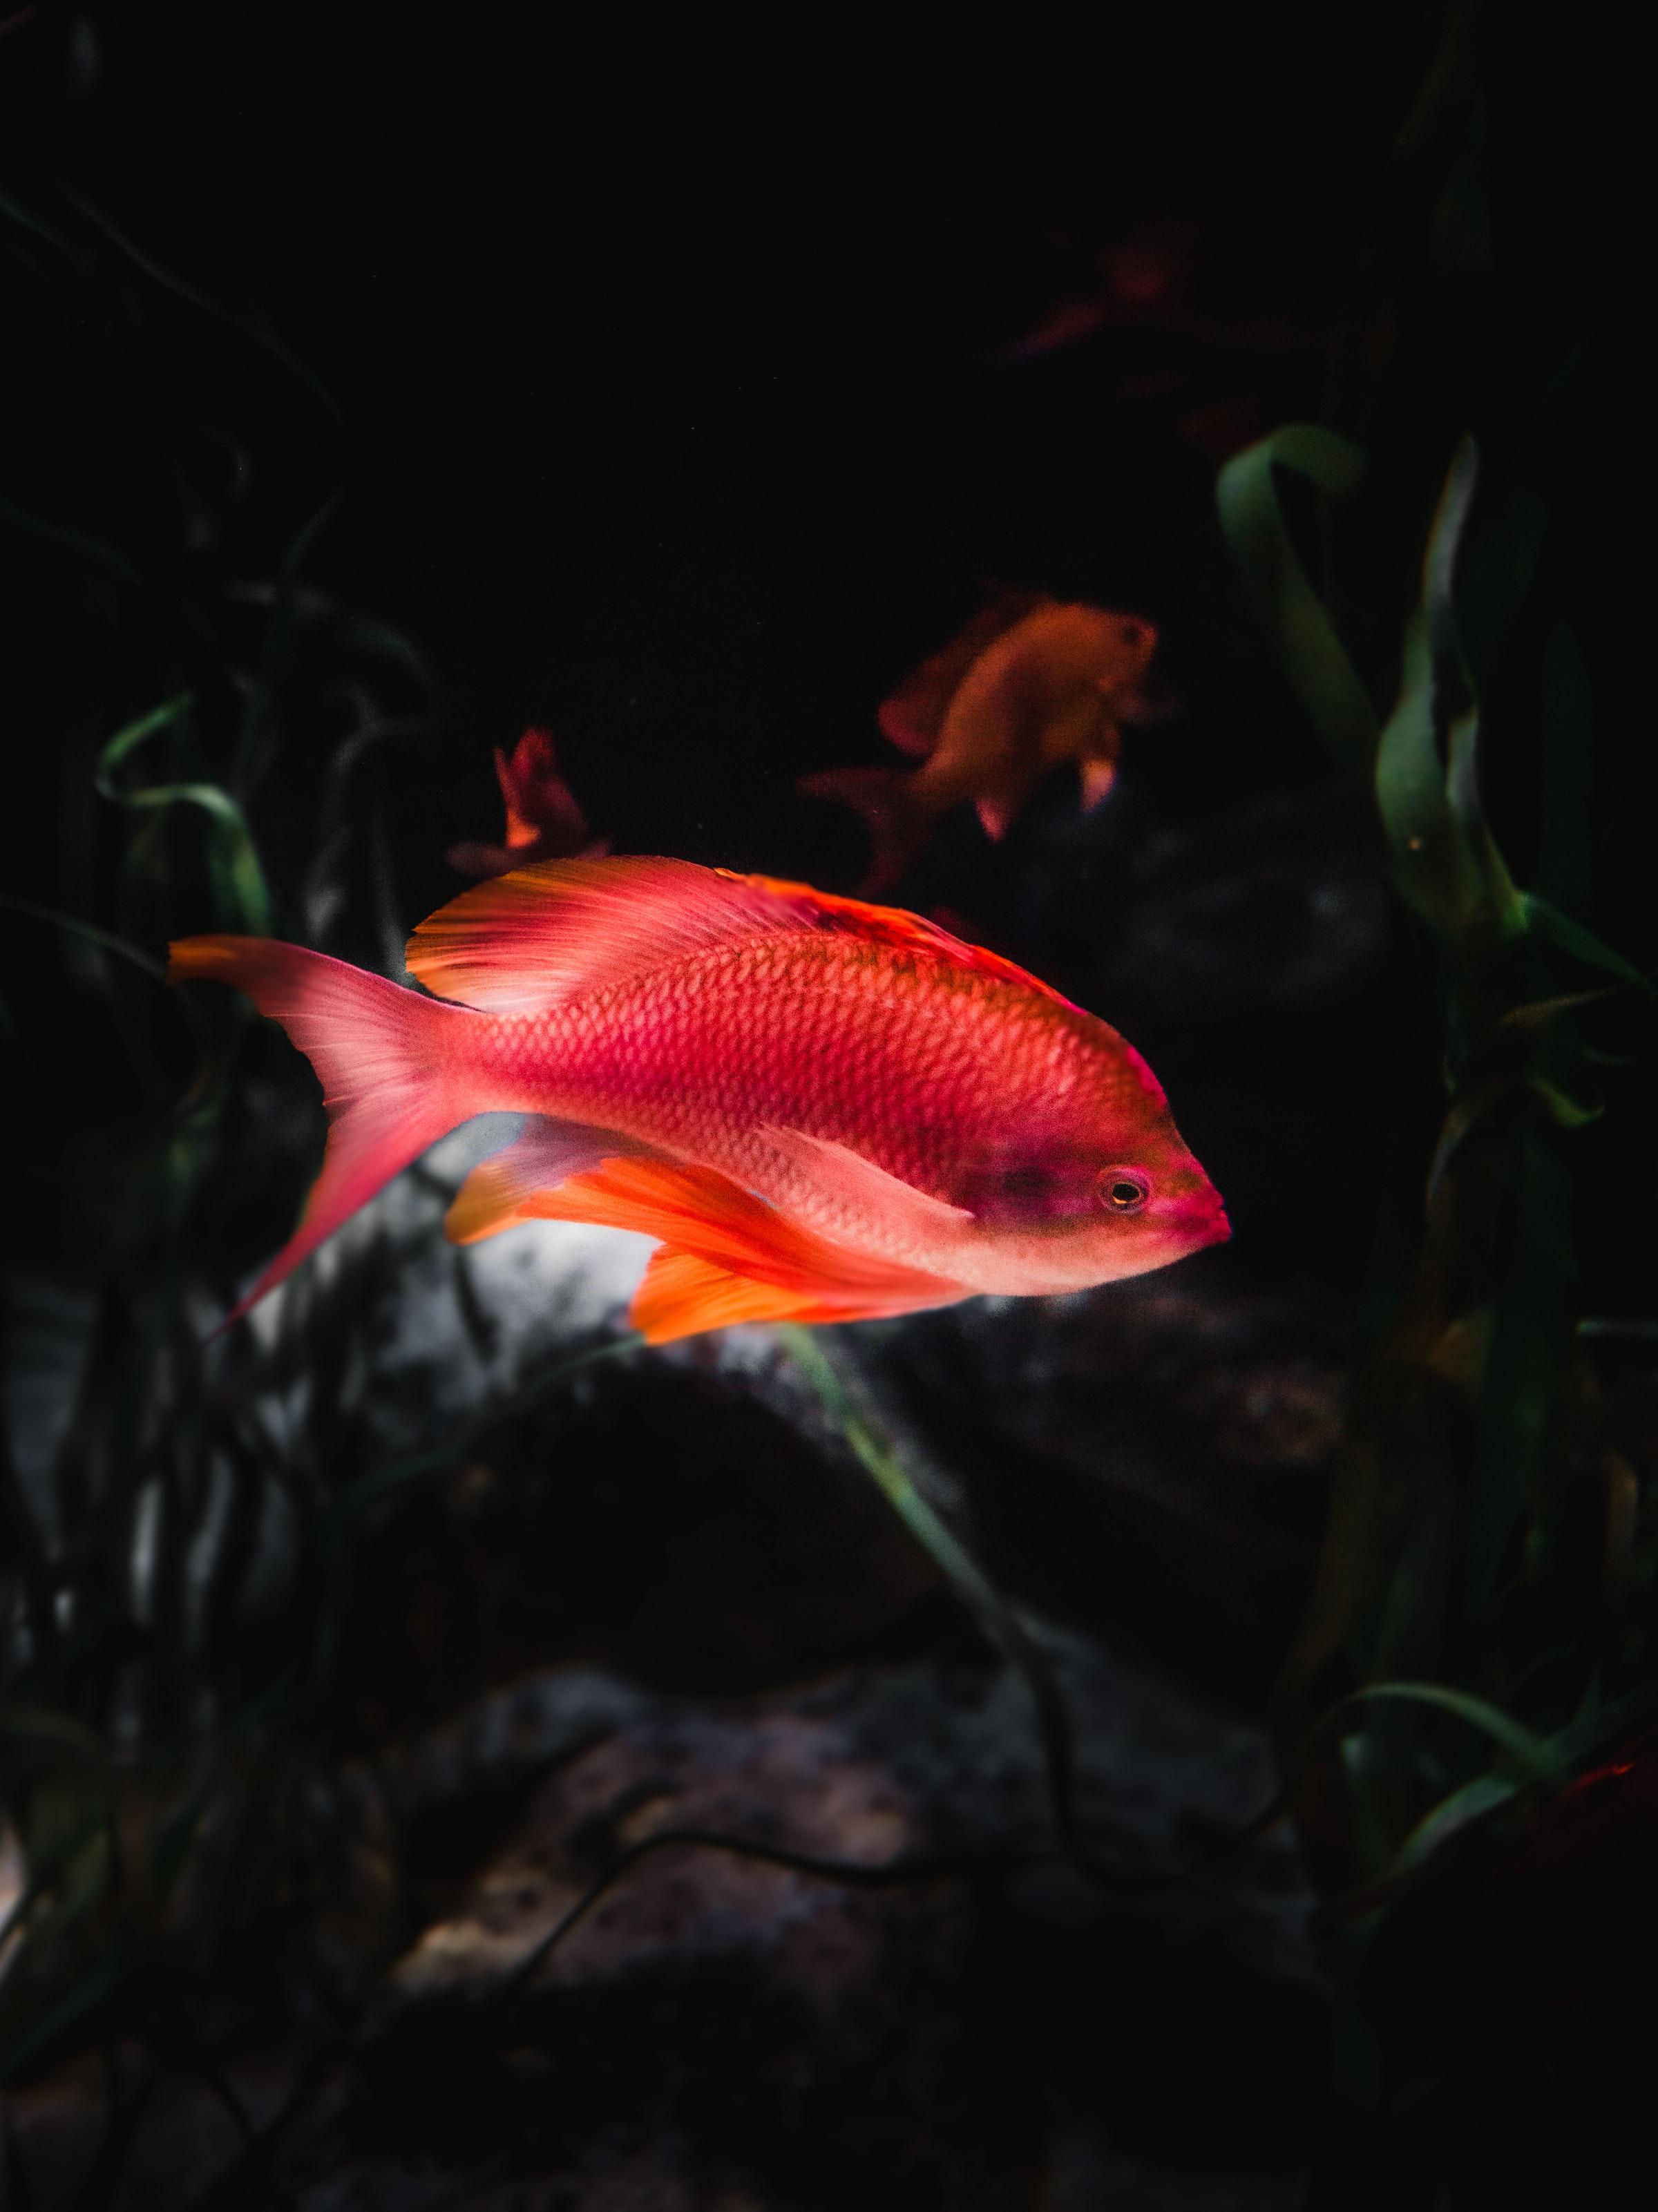 140681 Screensavers and Wallpapers Aquarium for phone. Download Animals, Water, Aquarium, Fish, Orange Fish pictures for free